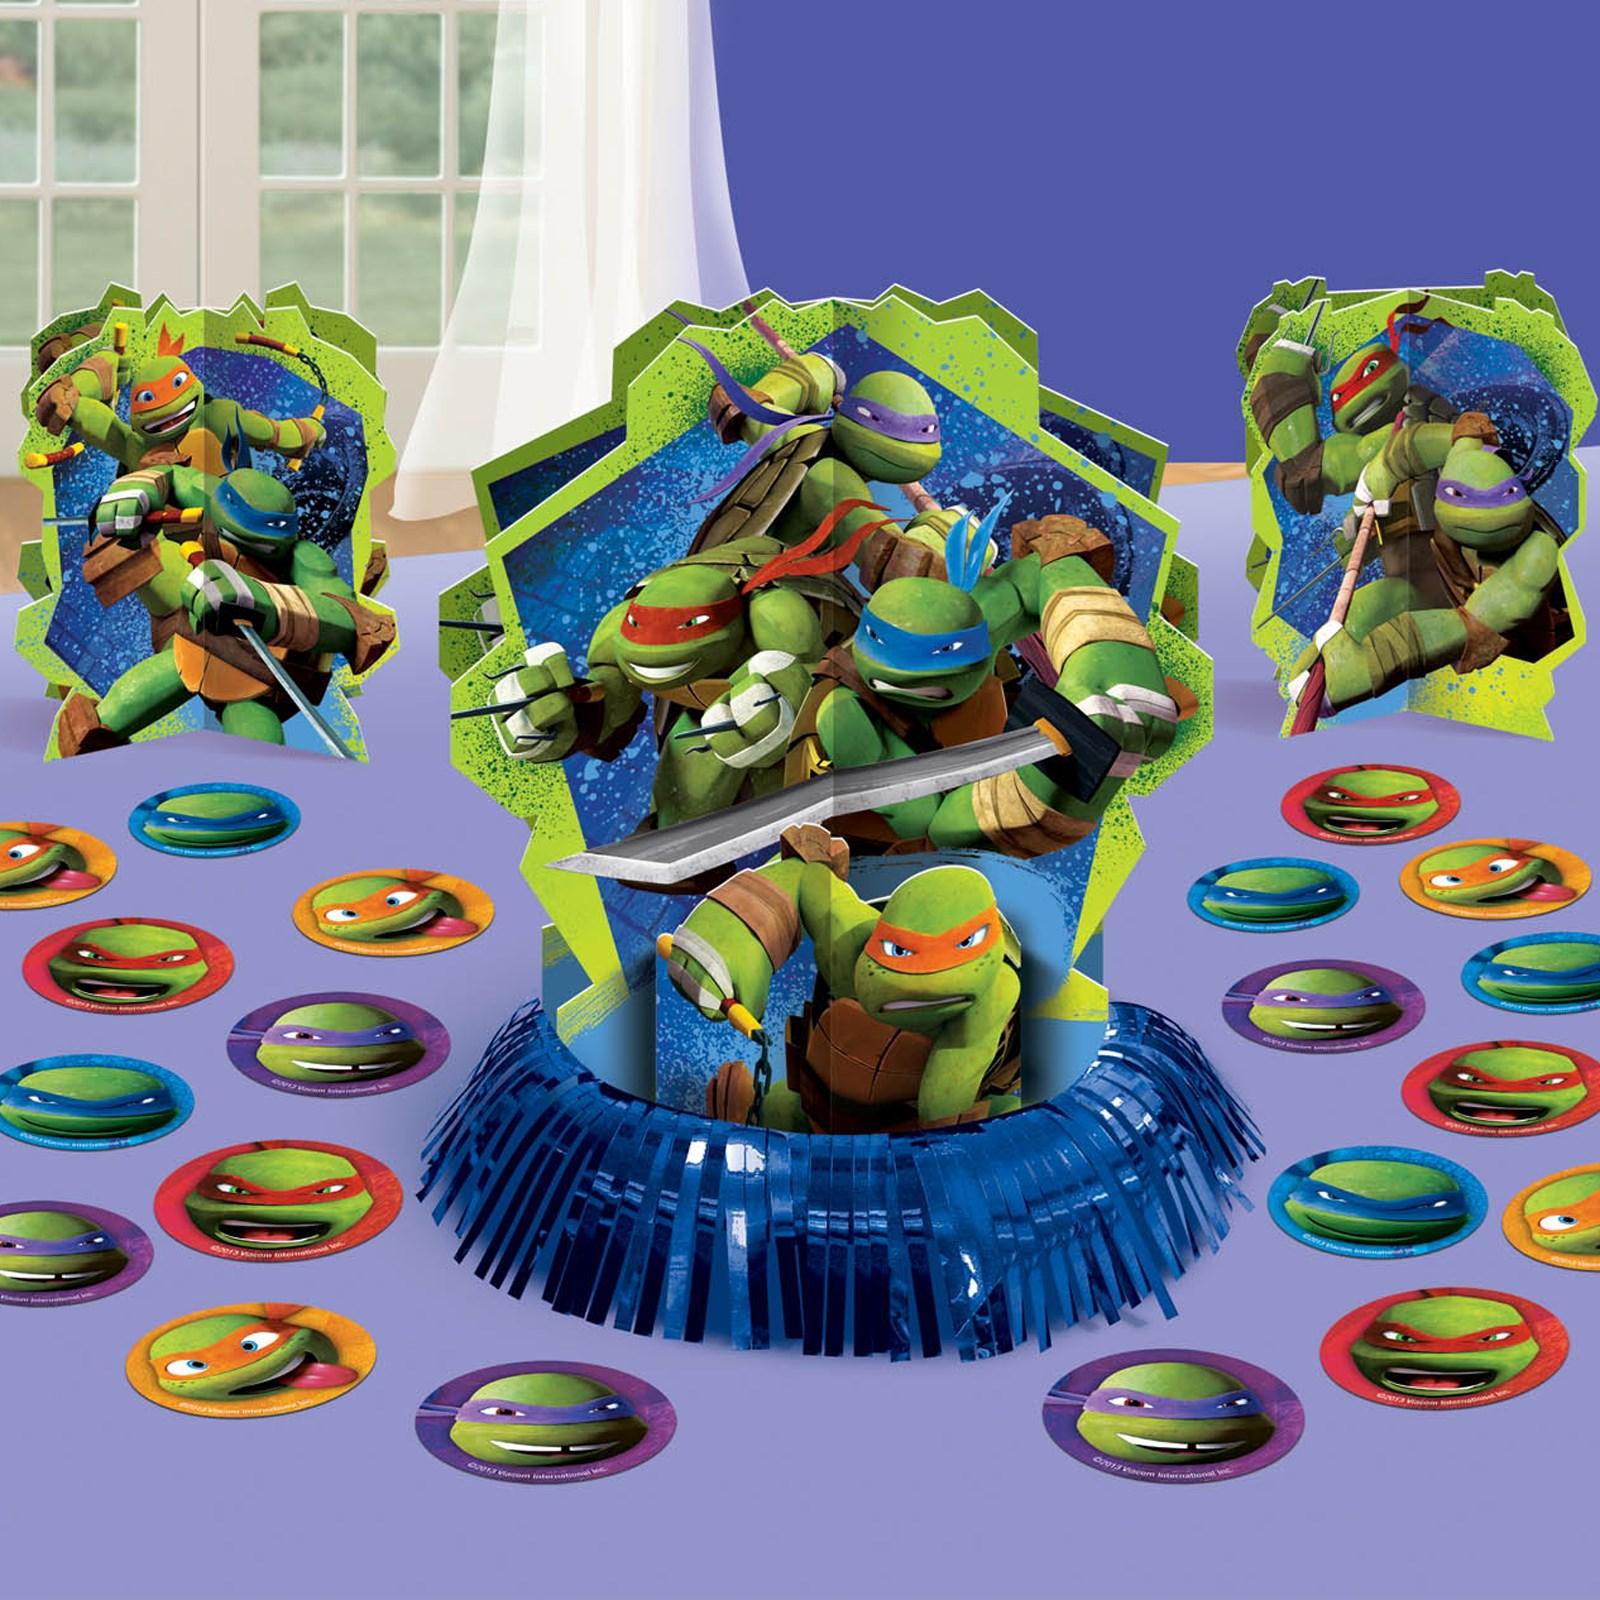 Ninja Turtle Bedroom Decor Teenage Mutant Ninja Turtles Party Supplies Birthdayexpresscom